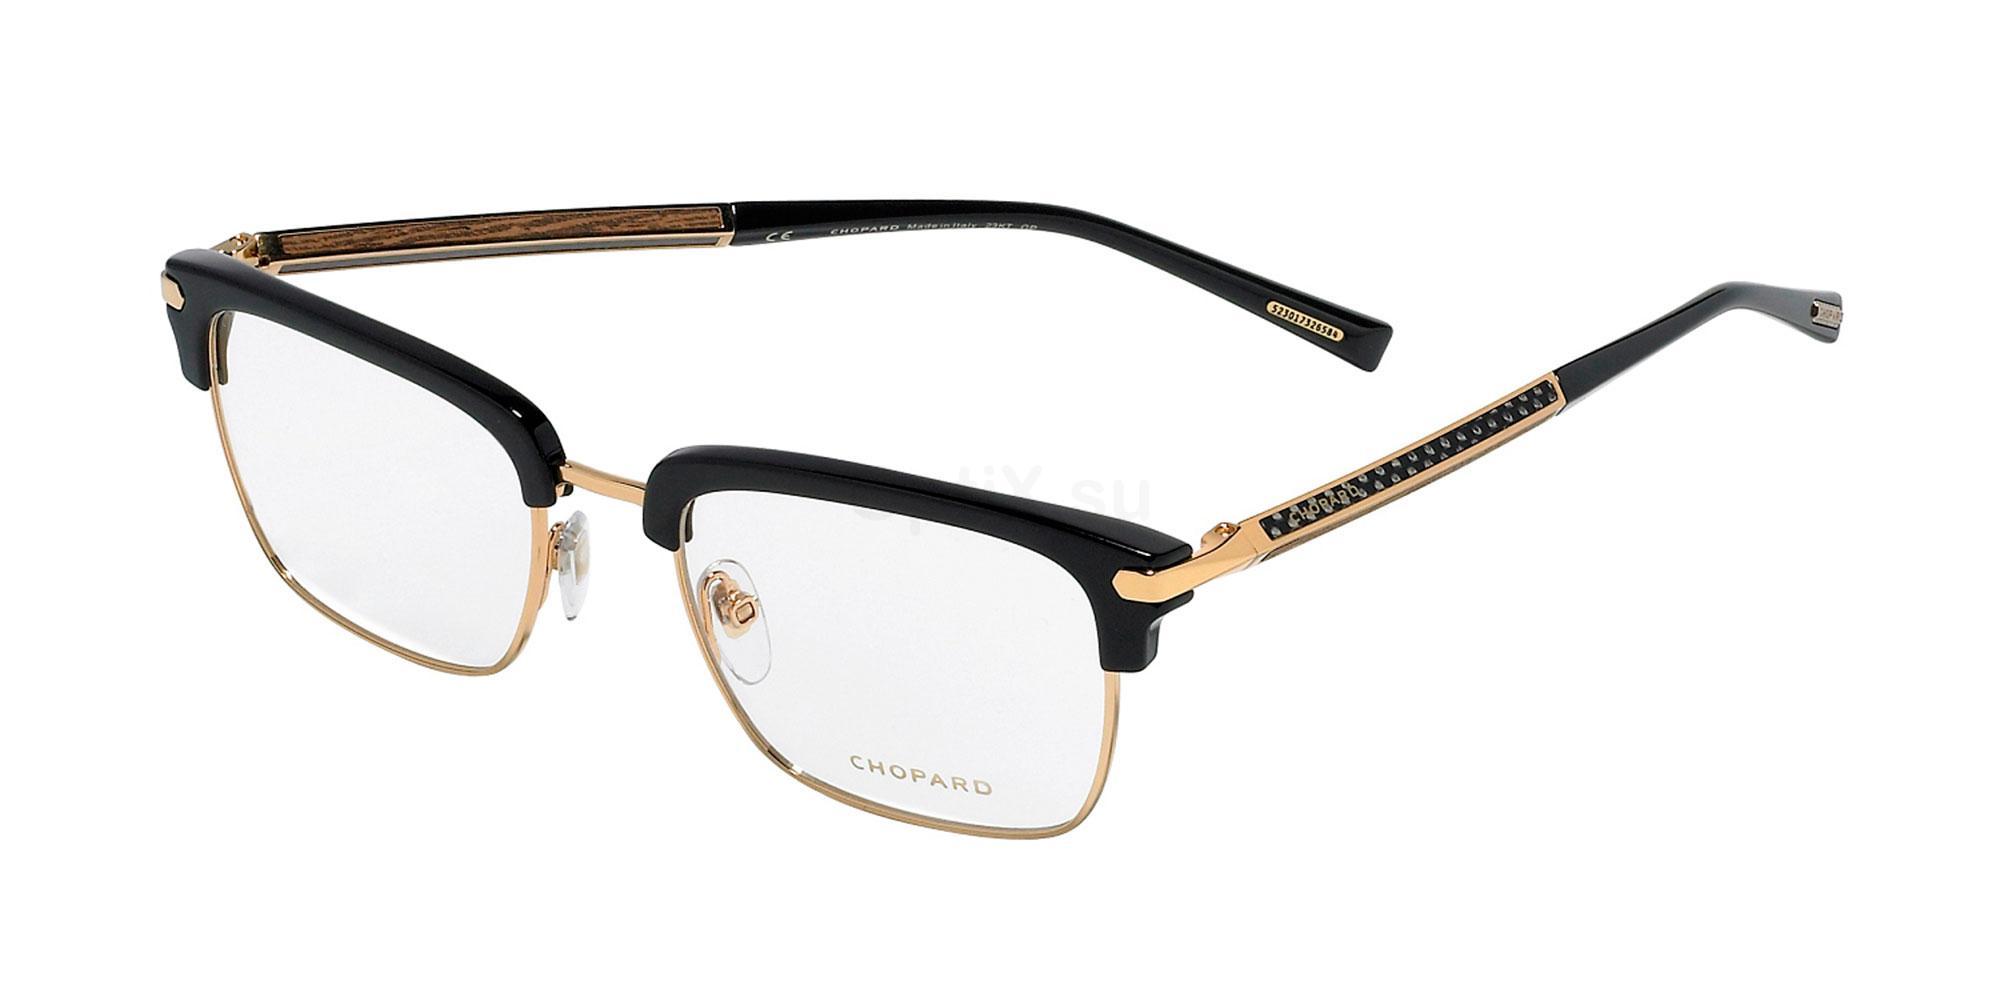 0300 VCHC57 Glasses, Chopard